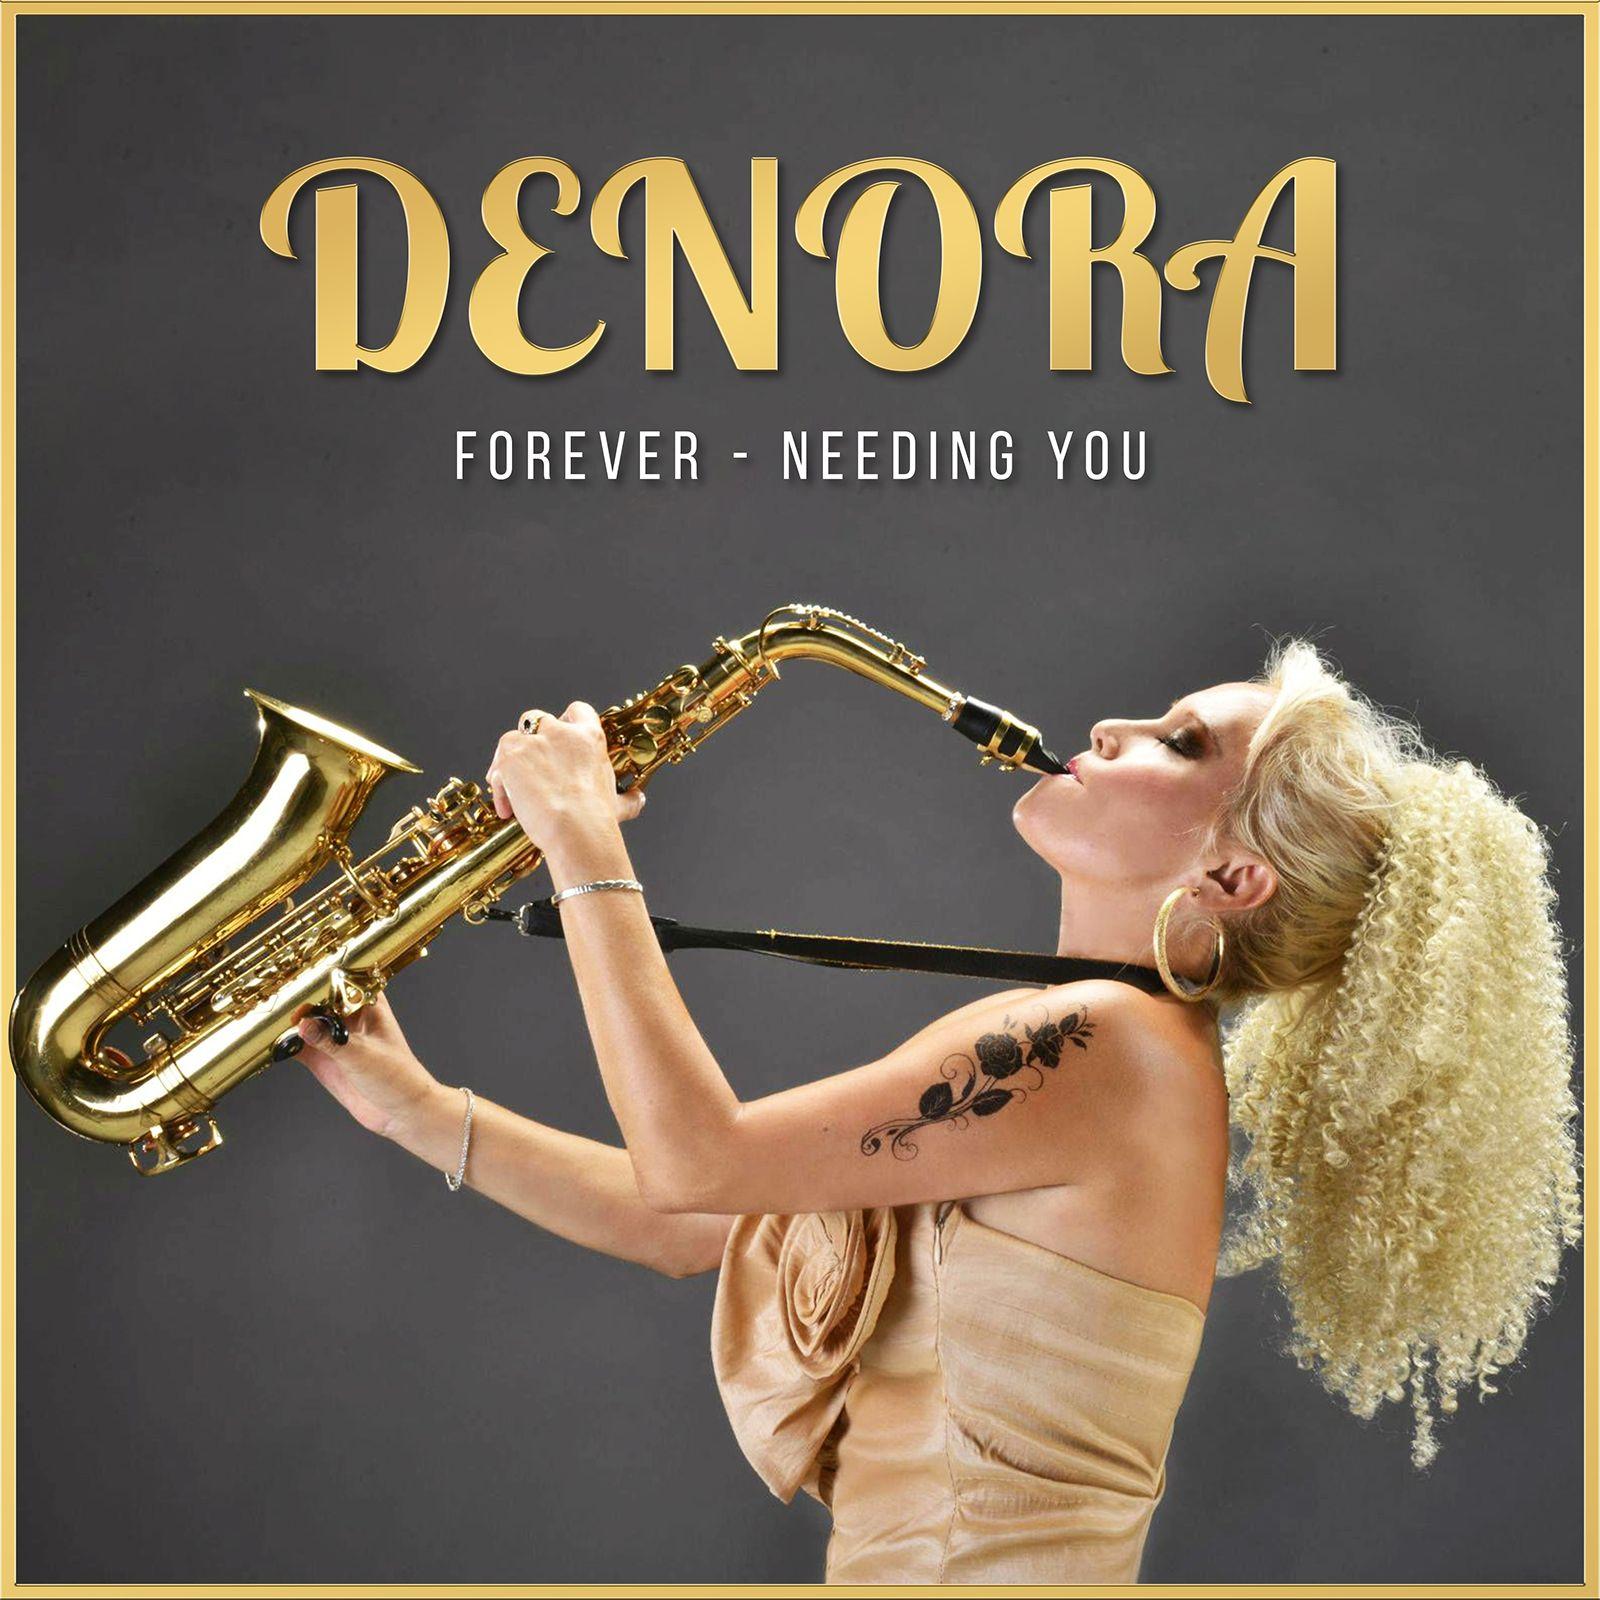 Denora